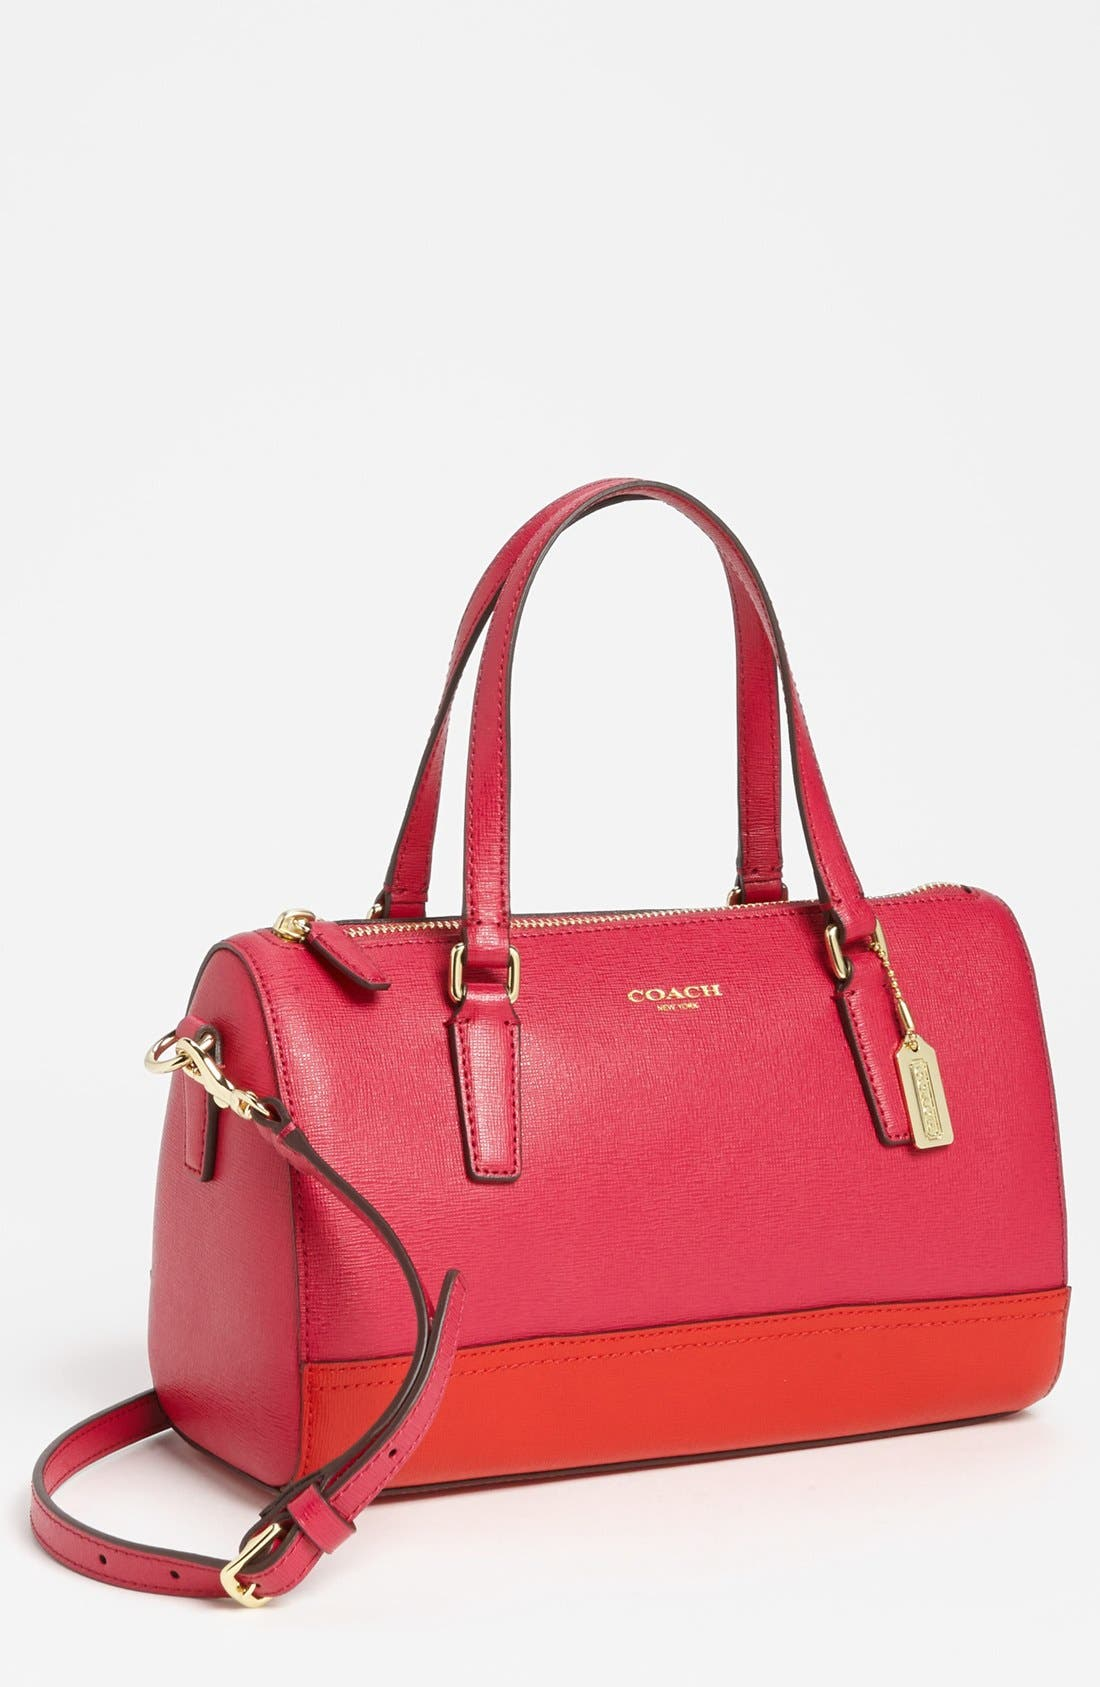 Alternate Image 1 Selected - COACH 'Mini' Saffiano Leather Satchel